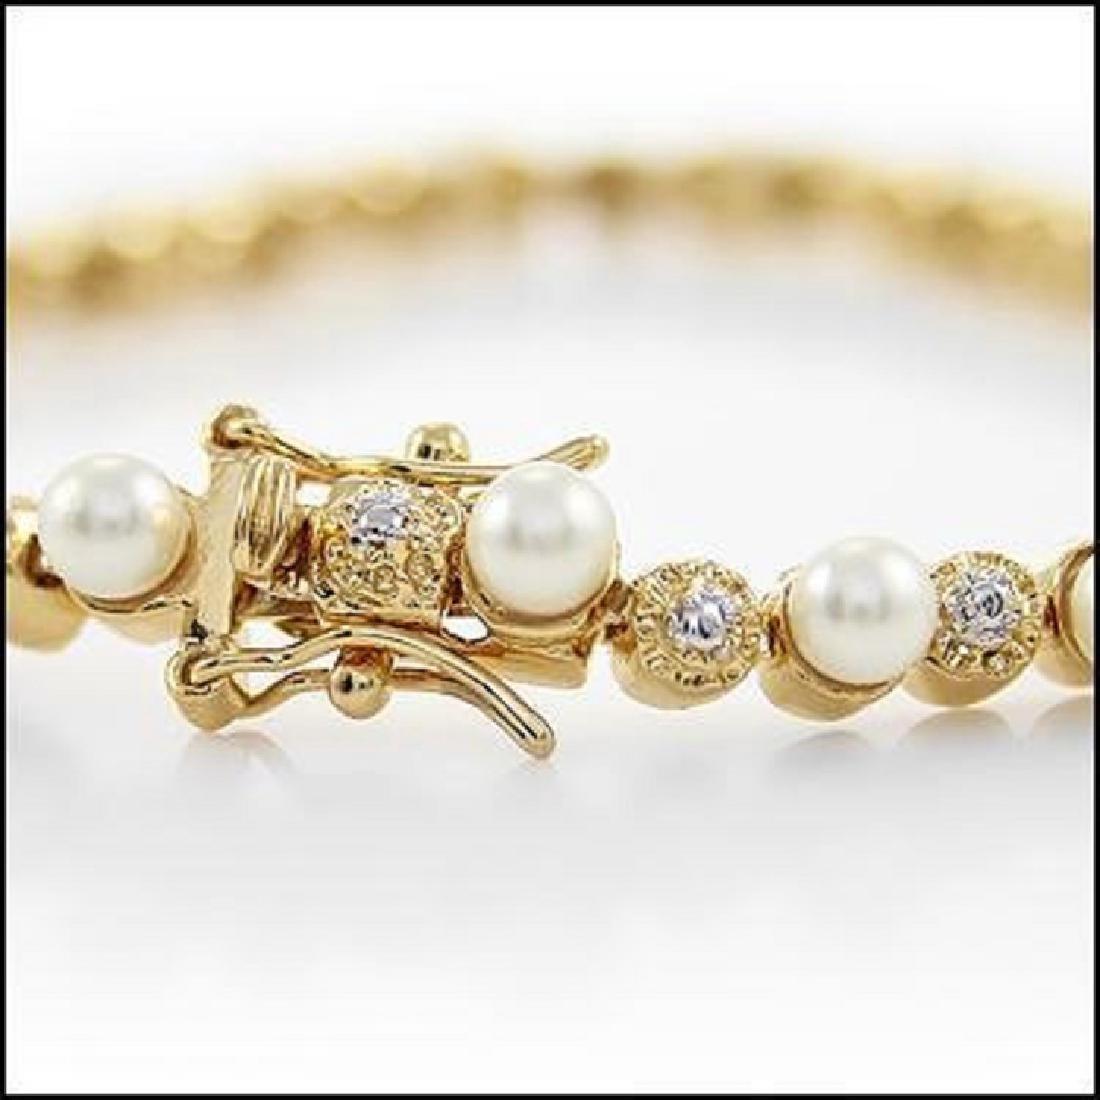 9.84 CT Freshwater Pearl & Diamond Bracelet $1455 - 2